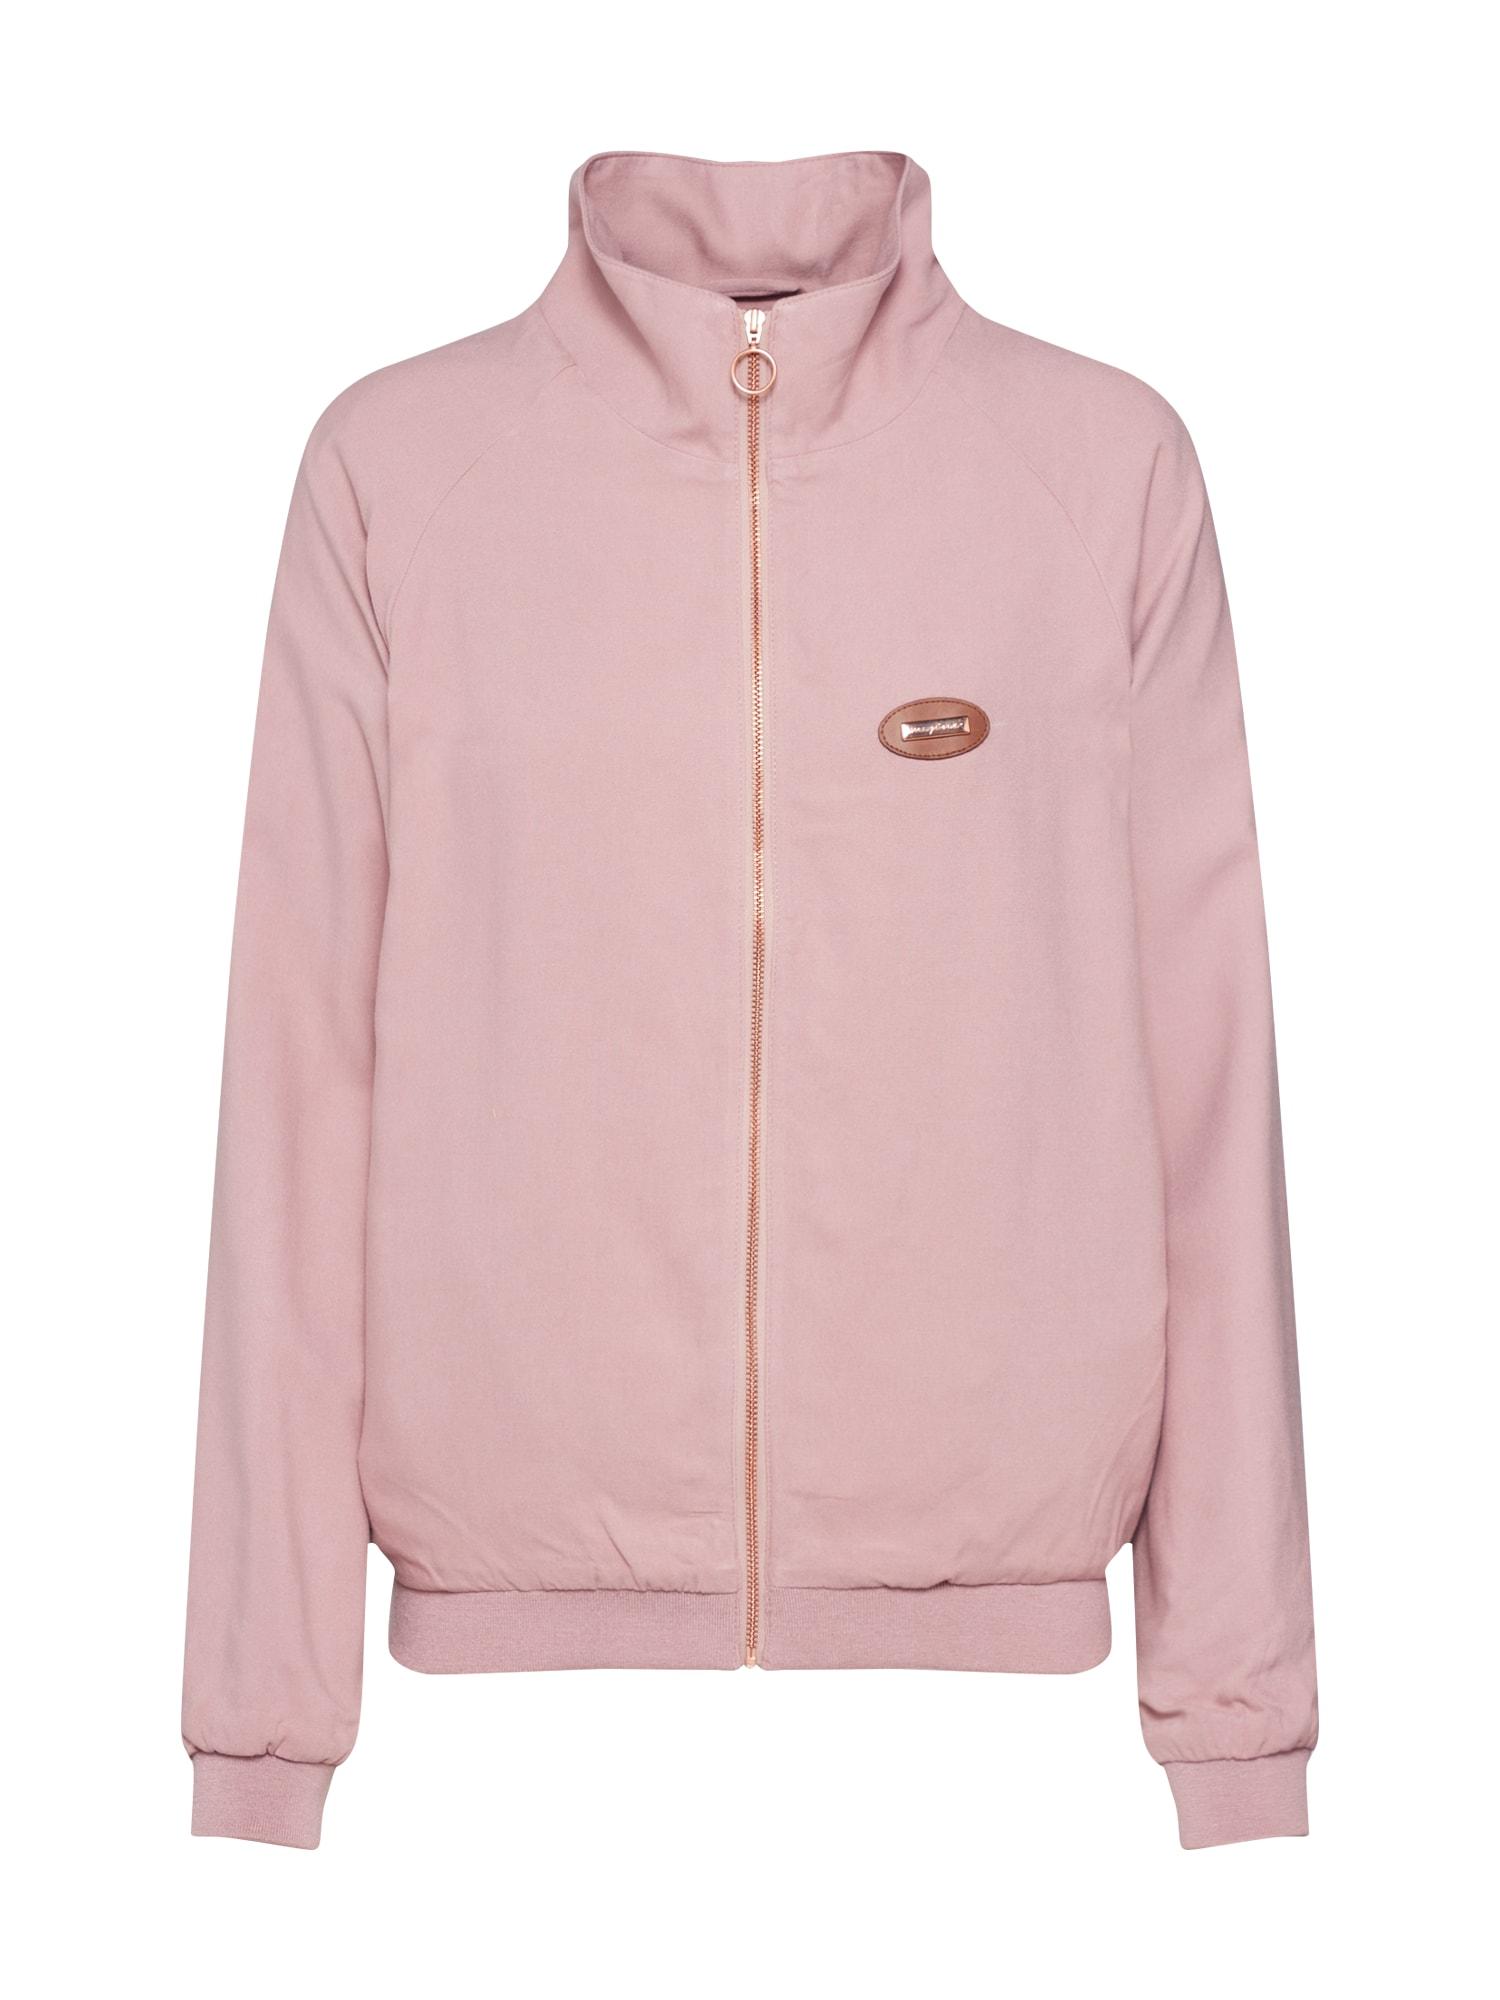 Přechodná bunda Karen růžová Mazine